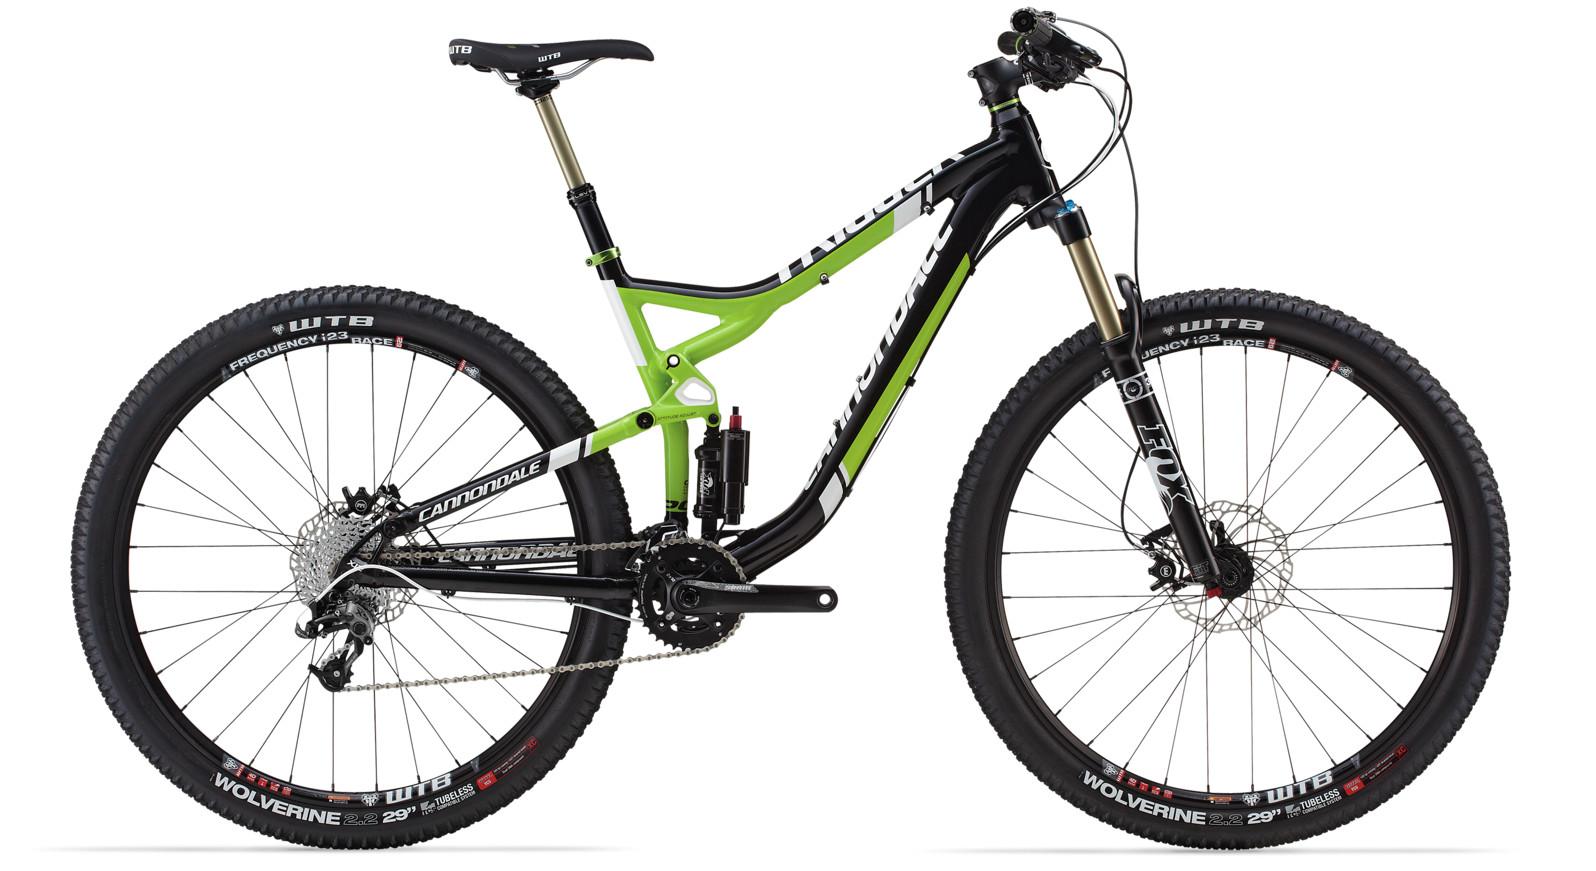 bike - 2014 Cannondale Trigger 29 3